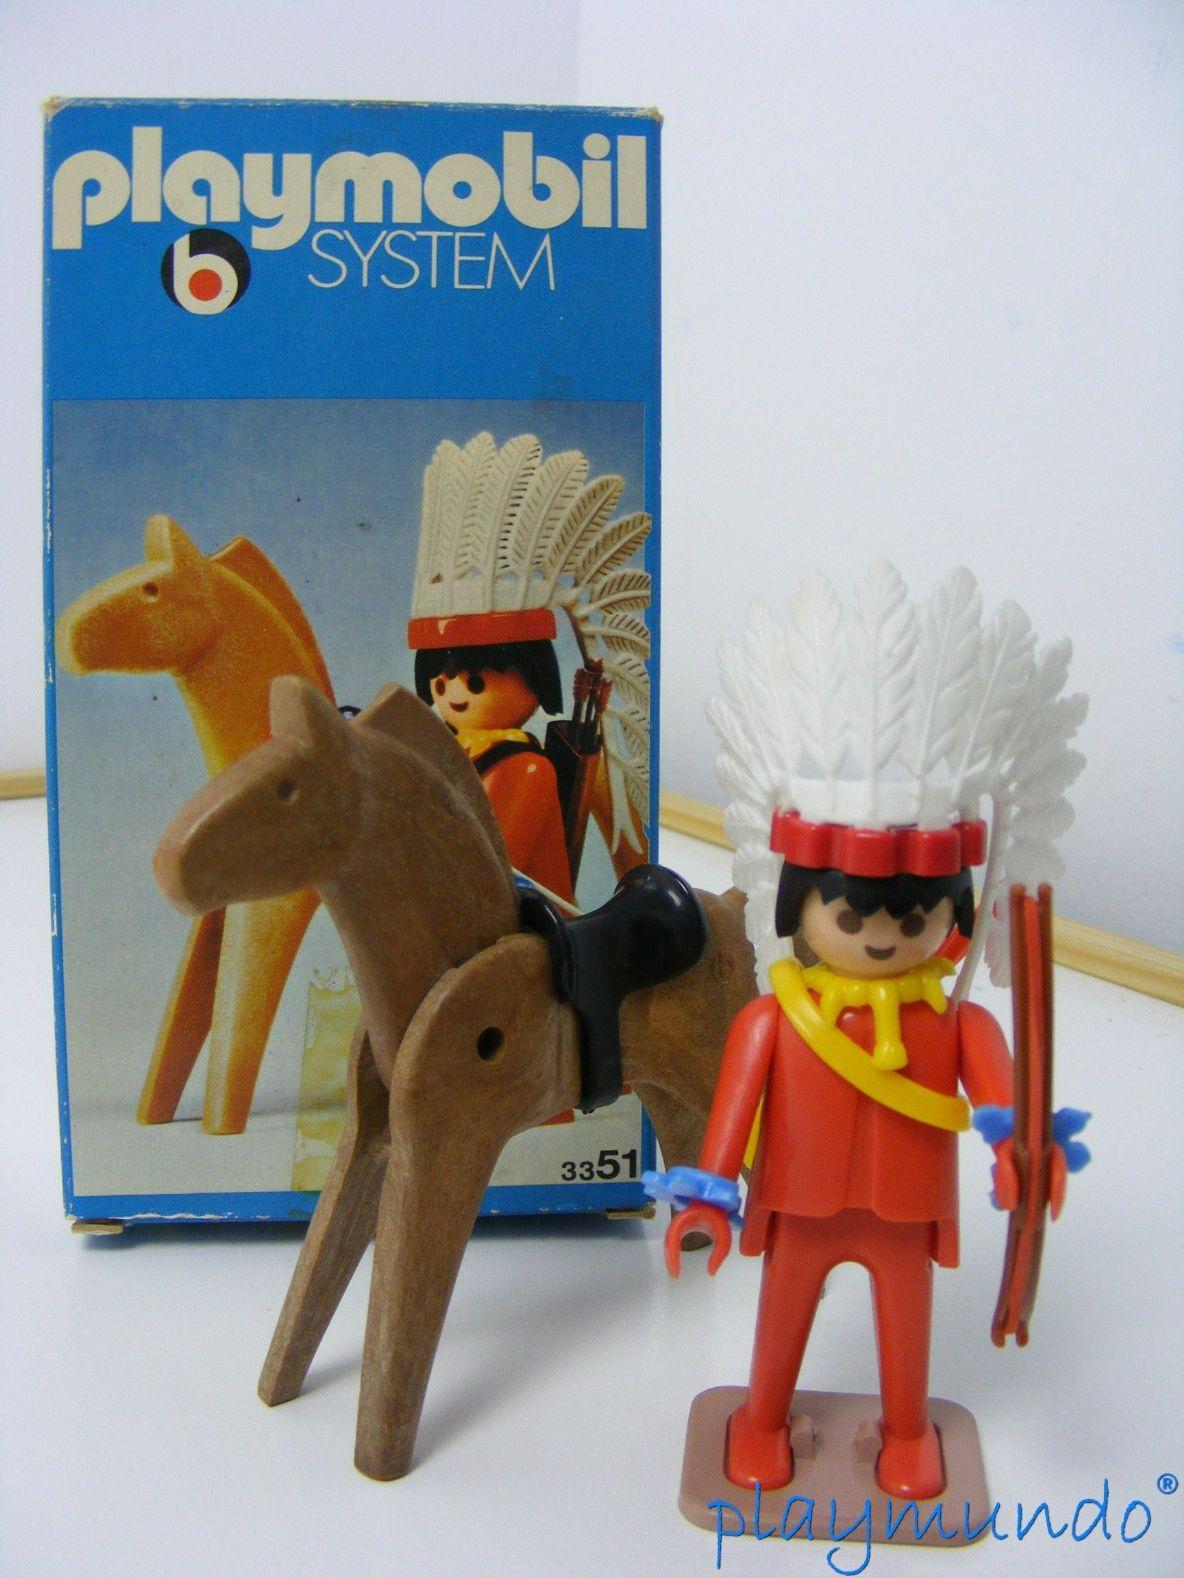 PLAYMOBIL 3351 JEFE INDIO OESTE WESTERN (AÑO 1975) VERSION 1